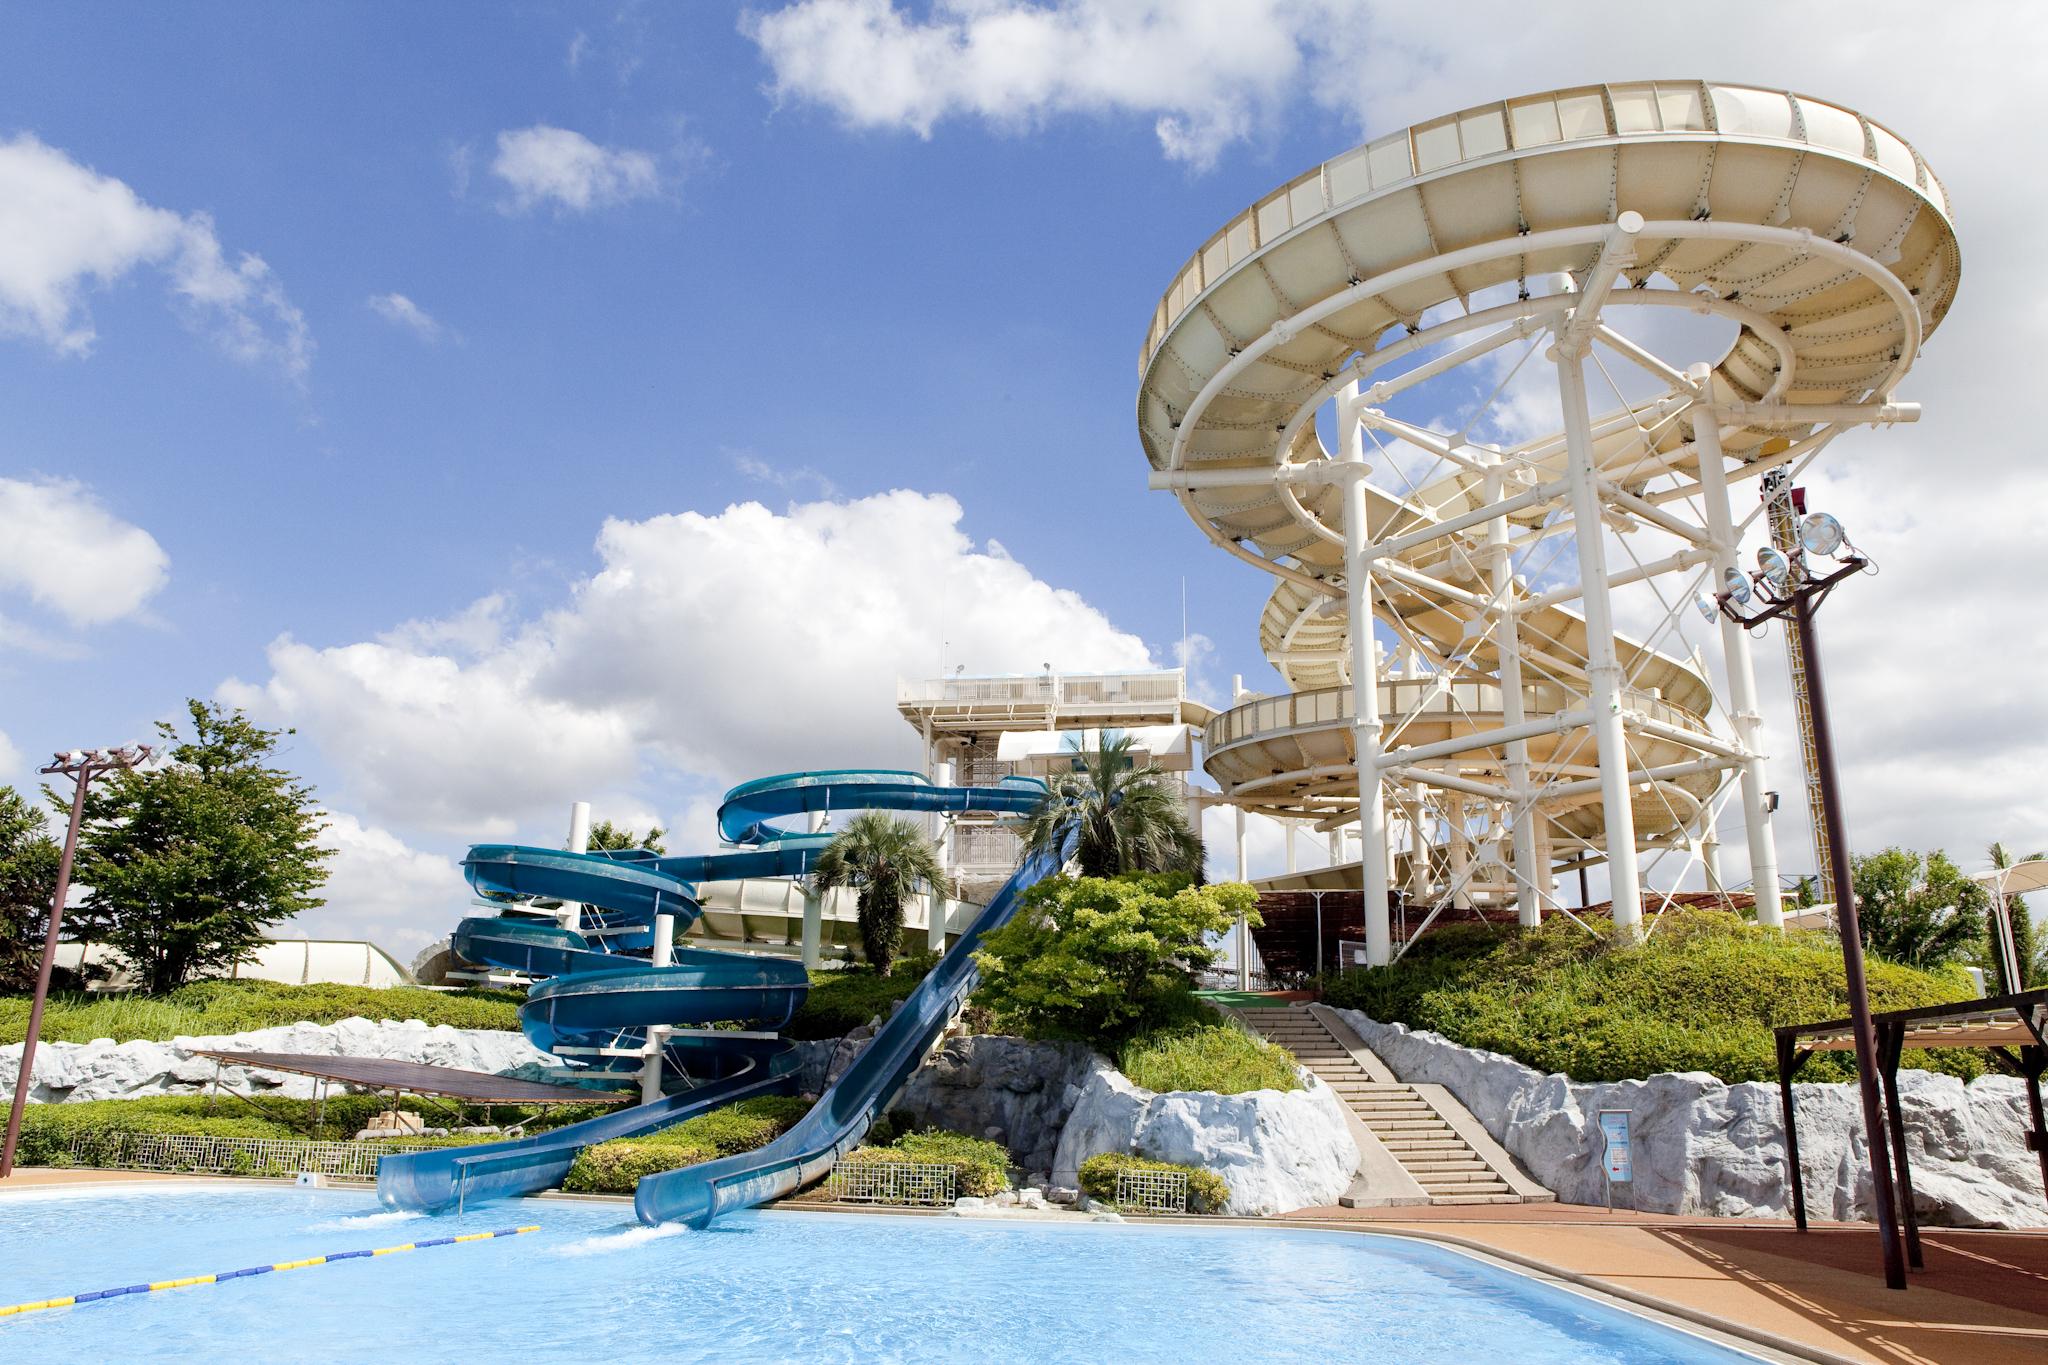 Best water parks in Tokyo